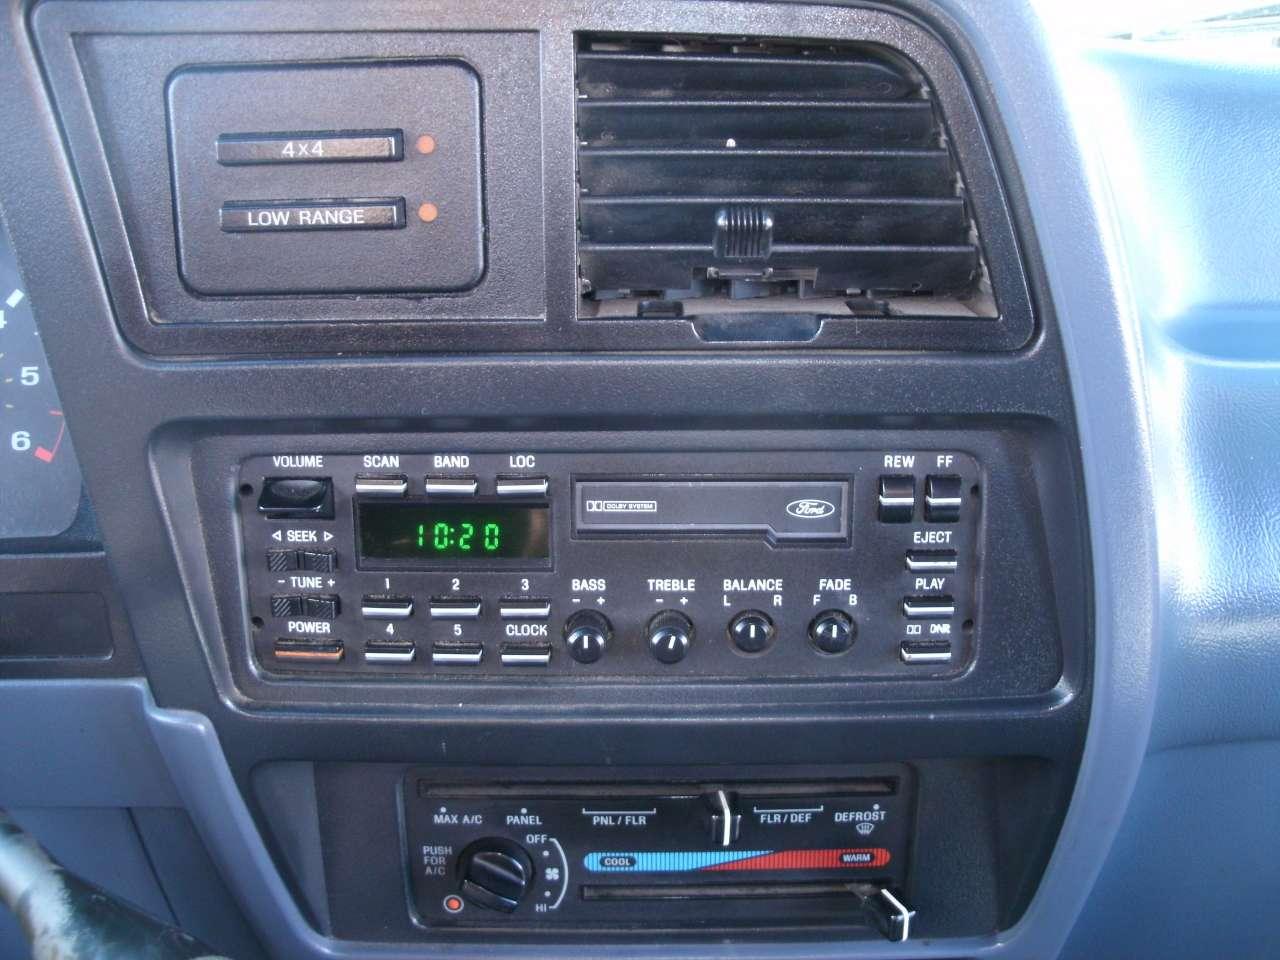 1994 Ford Explorer Radio Wiring Diagram Also 1994 Ford Ranger Radio